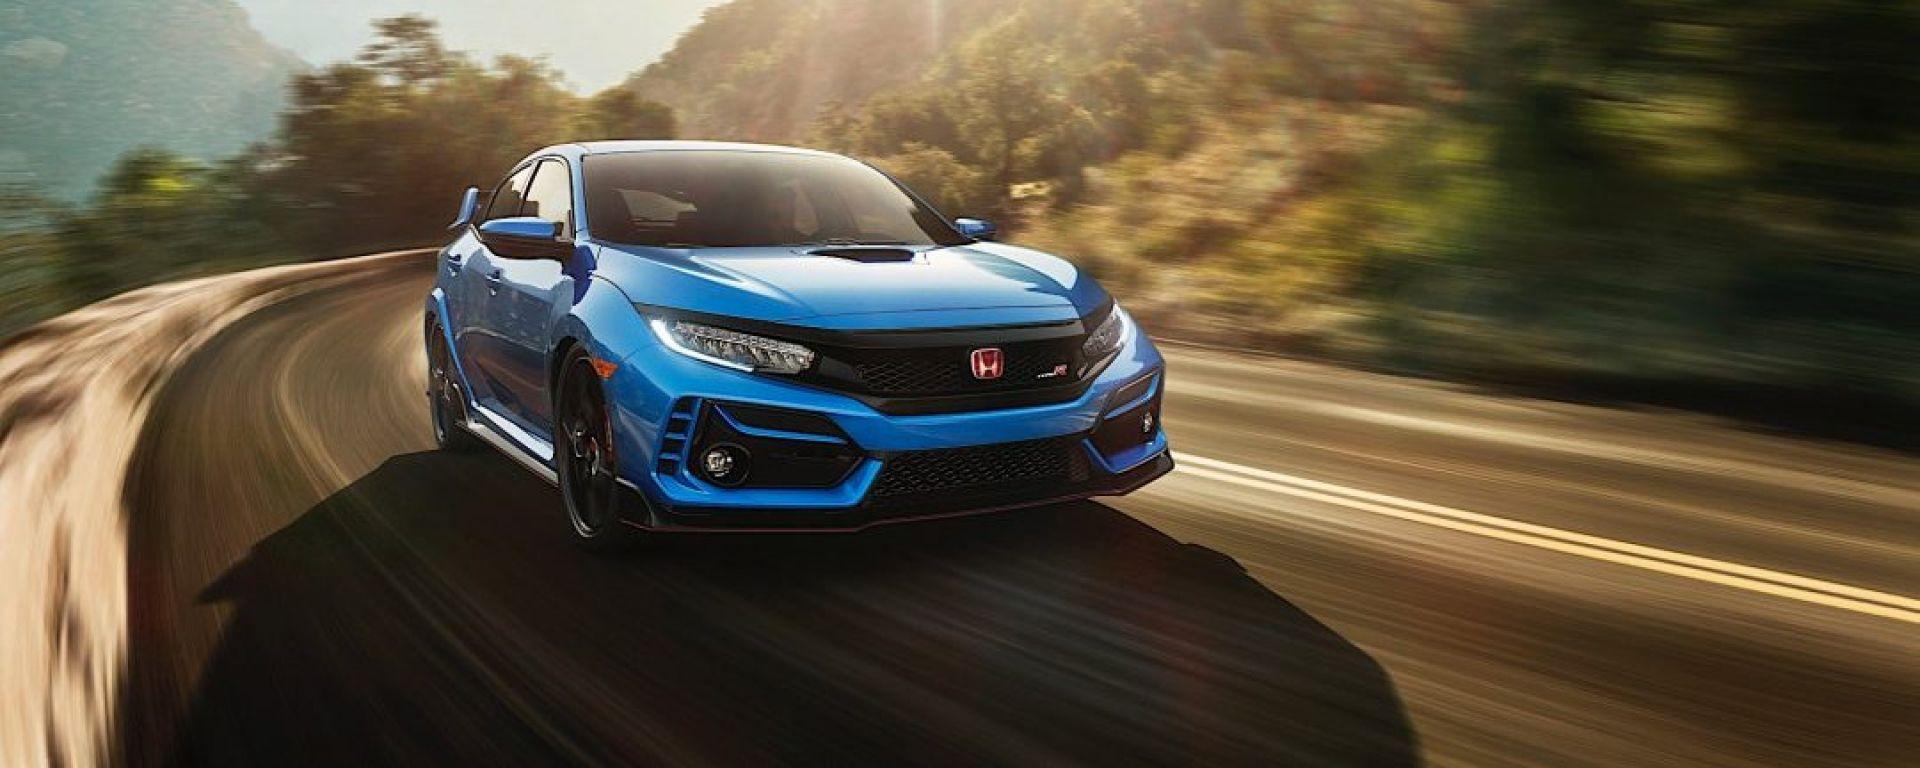 Nuova Honda Civic Type-R 2020: arriva il facelift